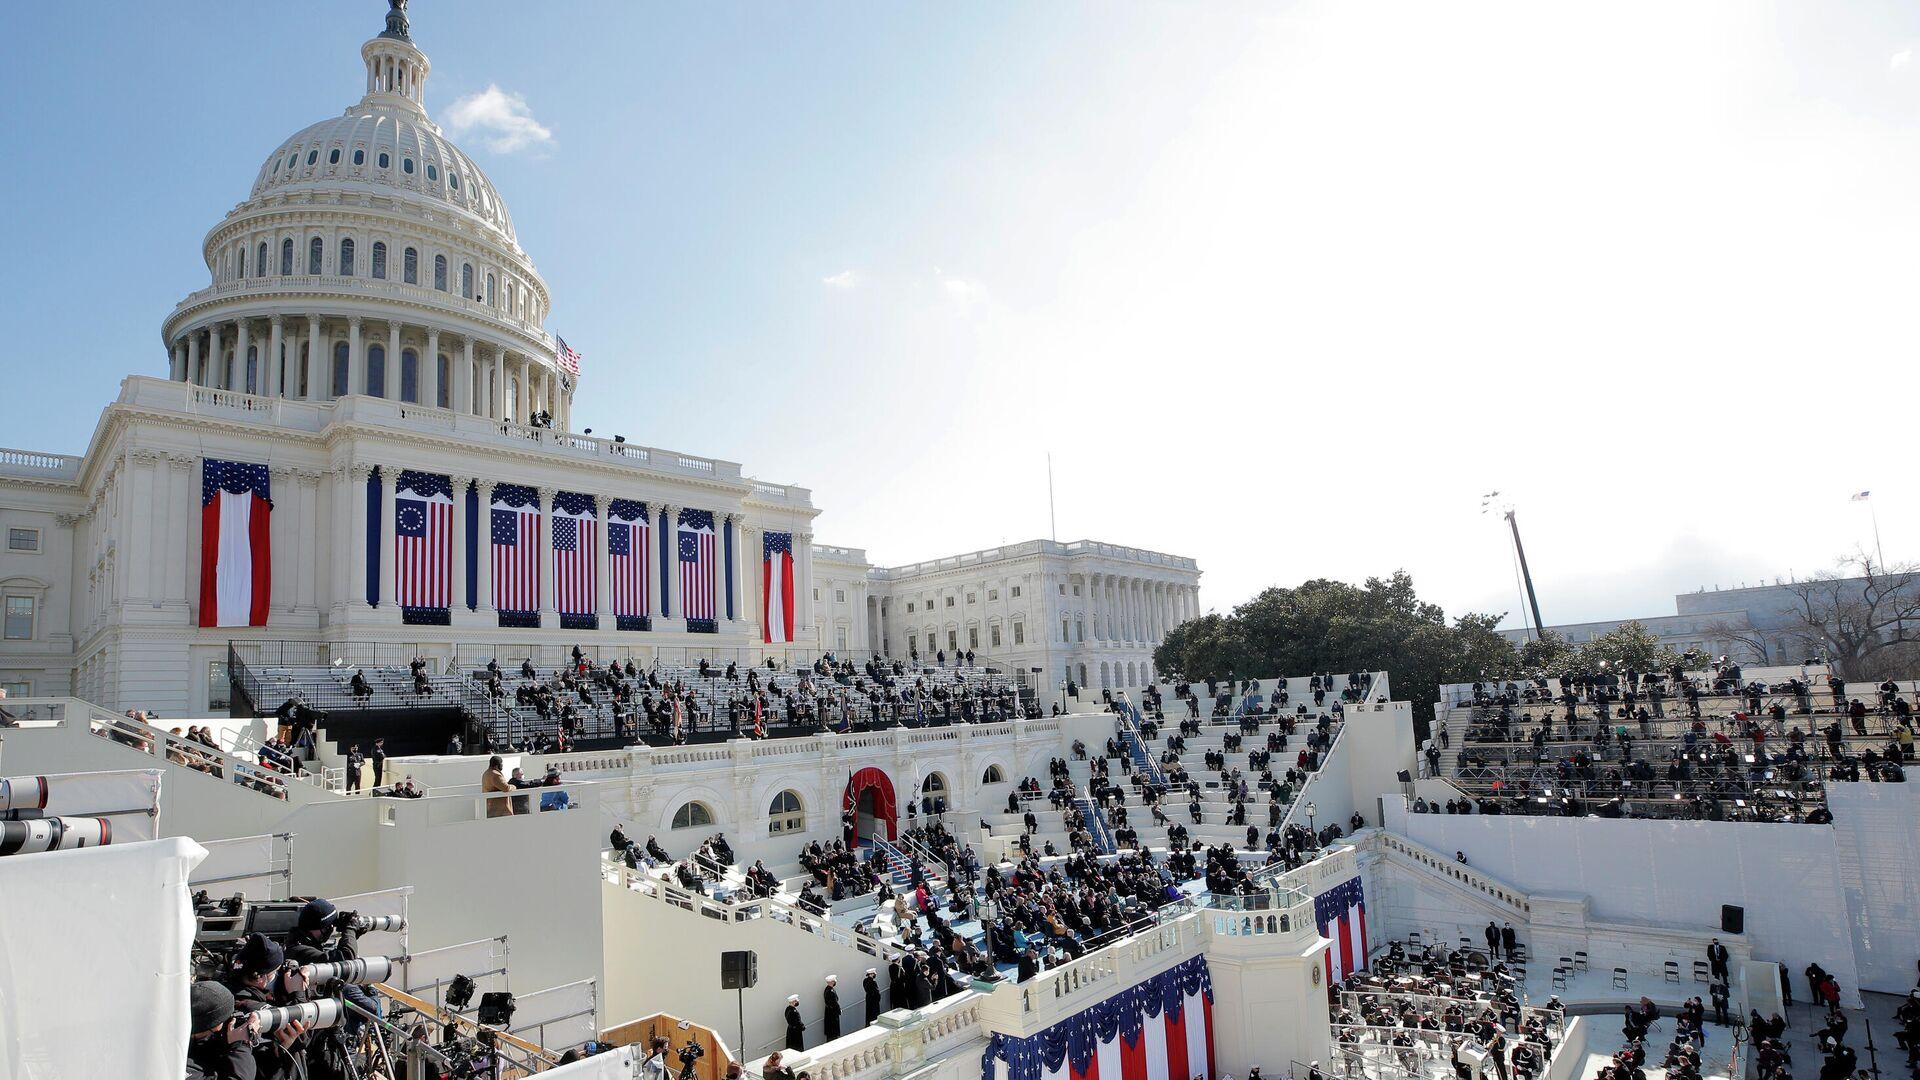 Церемония инаугурации Джо Байдена в Вашингтоне - РИА Новости, 1920, 20.01.2021